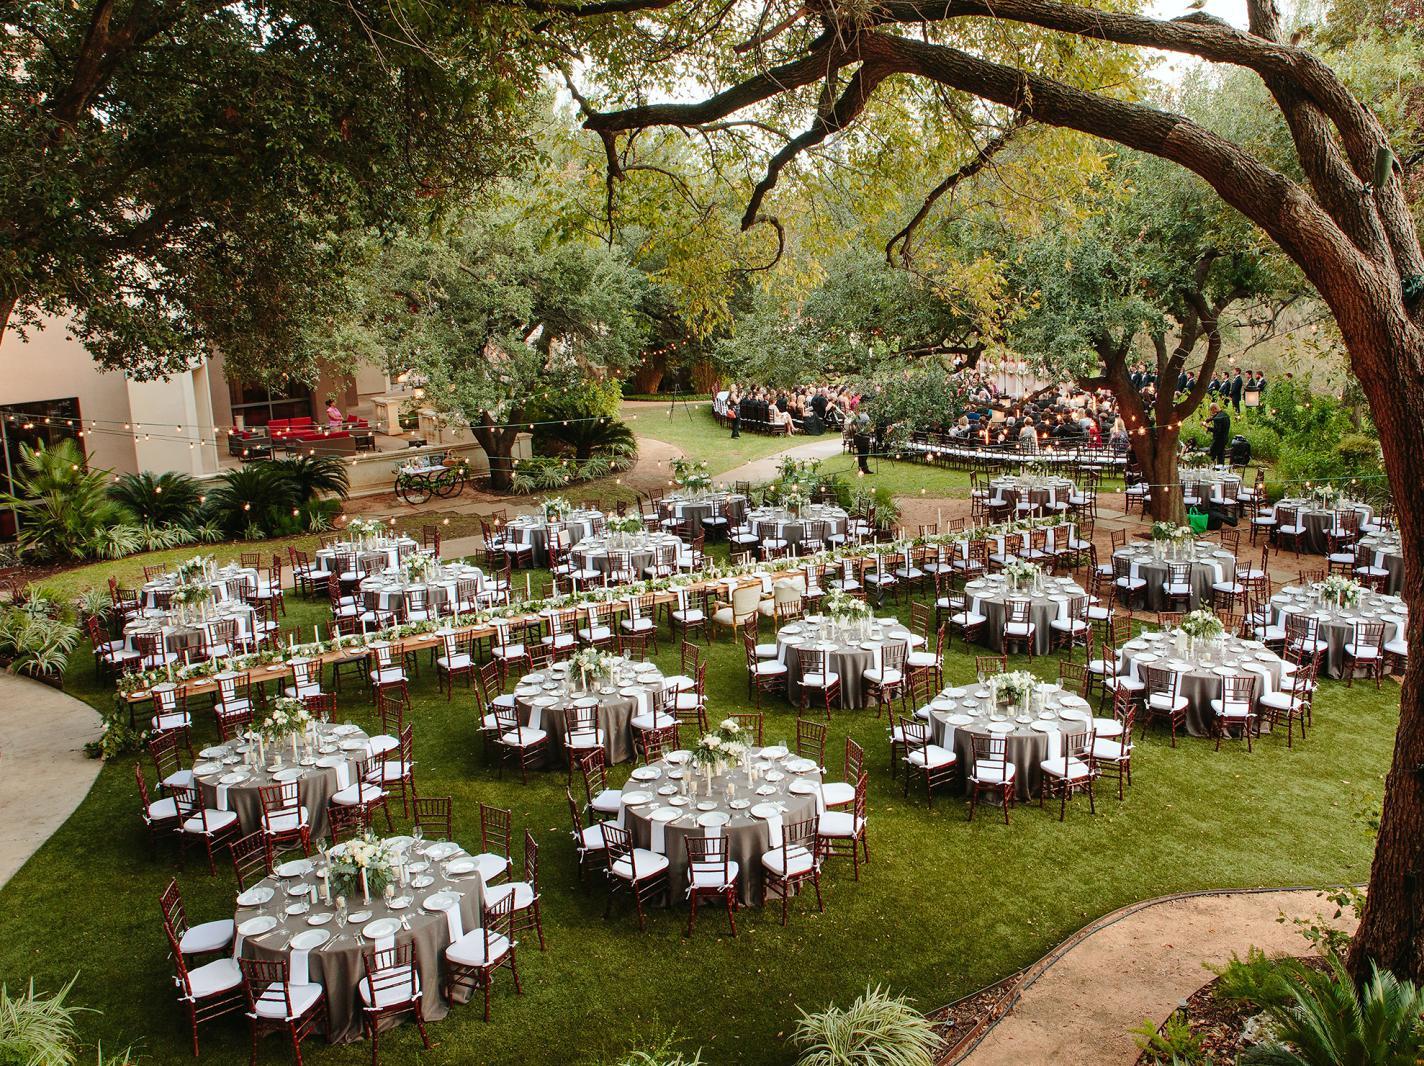 locatii nunta in aer liber